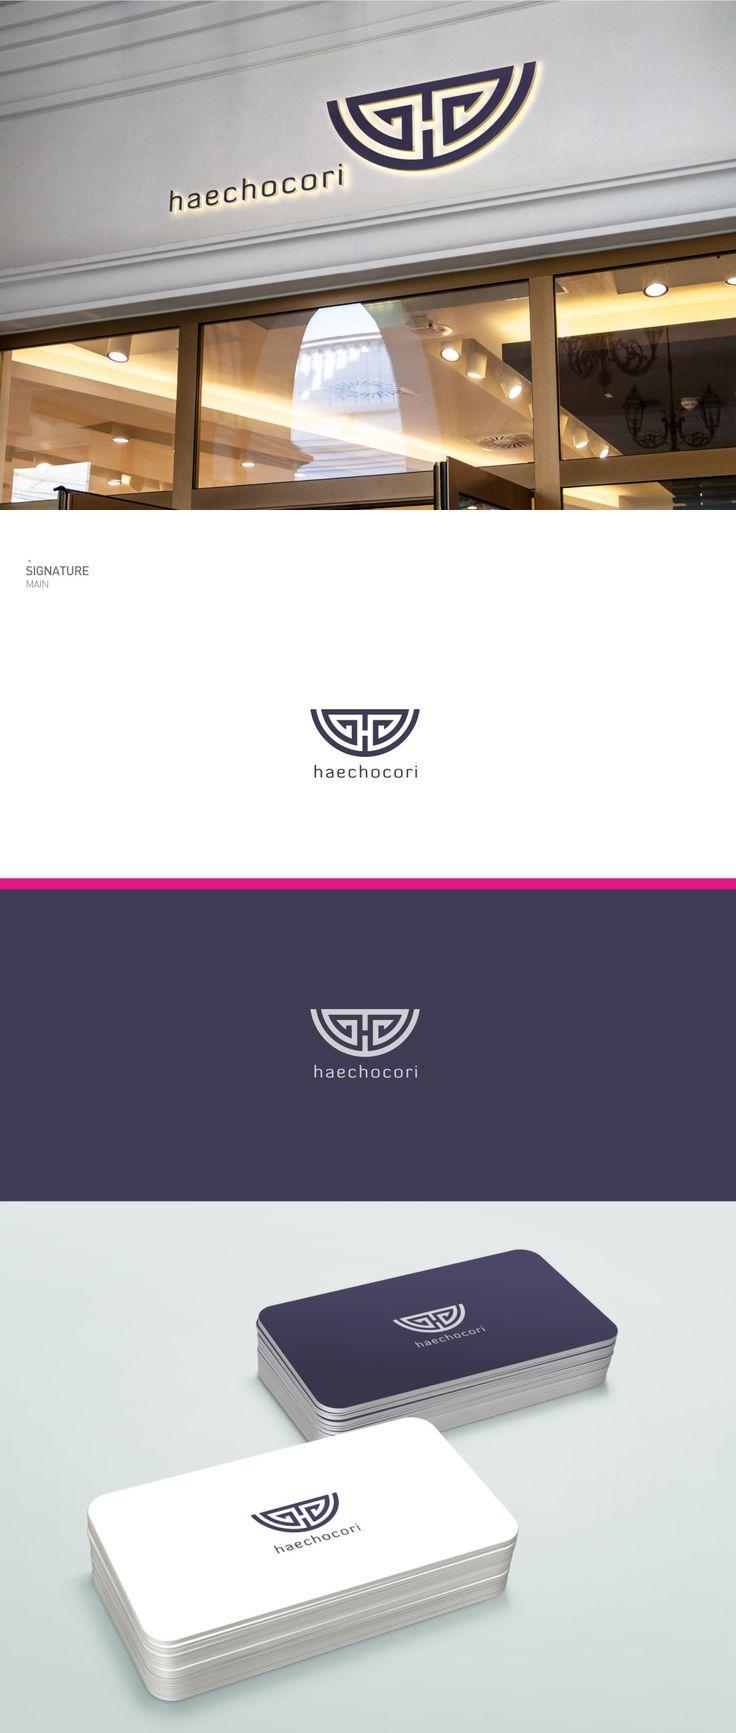 haechocori / Design by hellodesign / 한복 저고리의 아름다운 곡선미와 전통문양을 혼합하여 제작한 디자인 #로고디자인 #로고 #한복 #도형 #저고리 #디자인 #디자이너 #라우드소싱 #레퍼런스 #콘테스트 #logo #design #포트폴리오 #디자인의뢰 #공모전 #모더니즘 #맞팔 #심볼마크 #심볼 #일러스트 #작업 #컬러 #타이포그래피 #전통문양 #곡선미 #전통의상